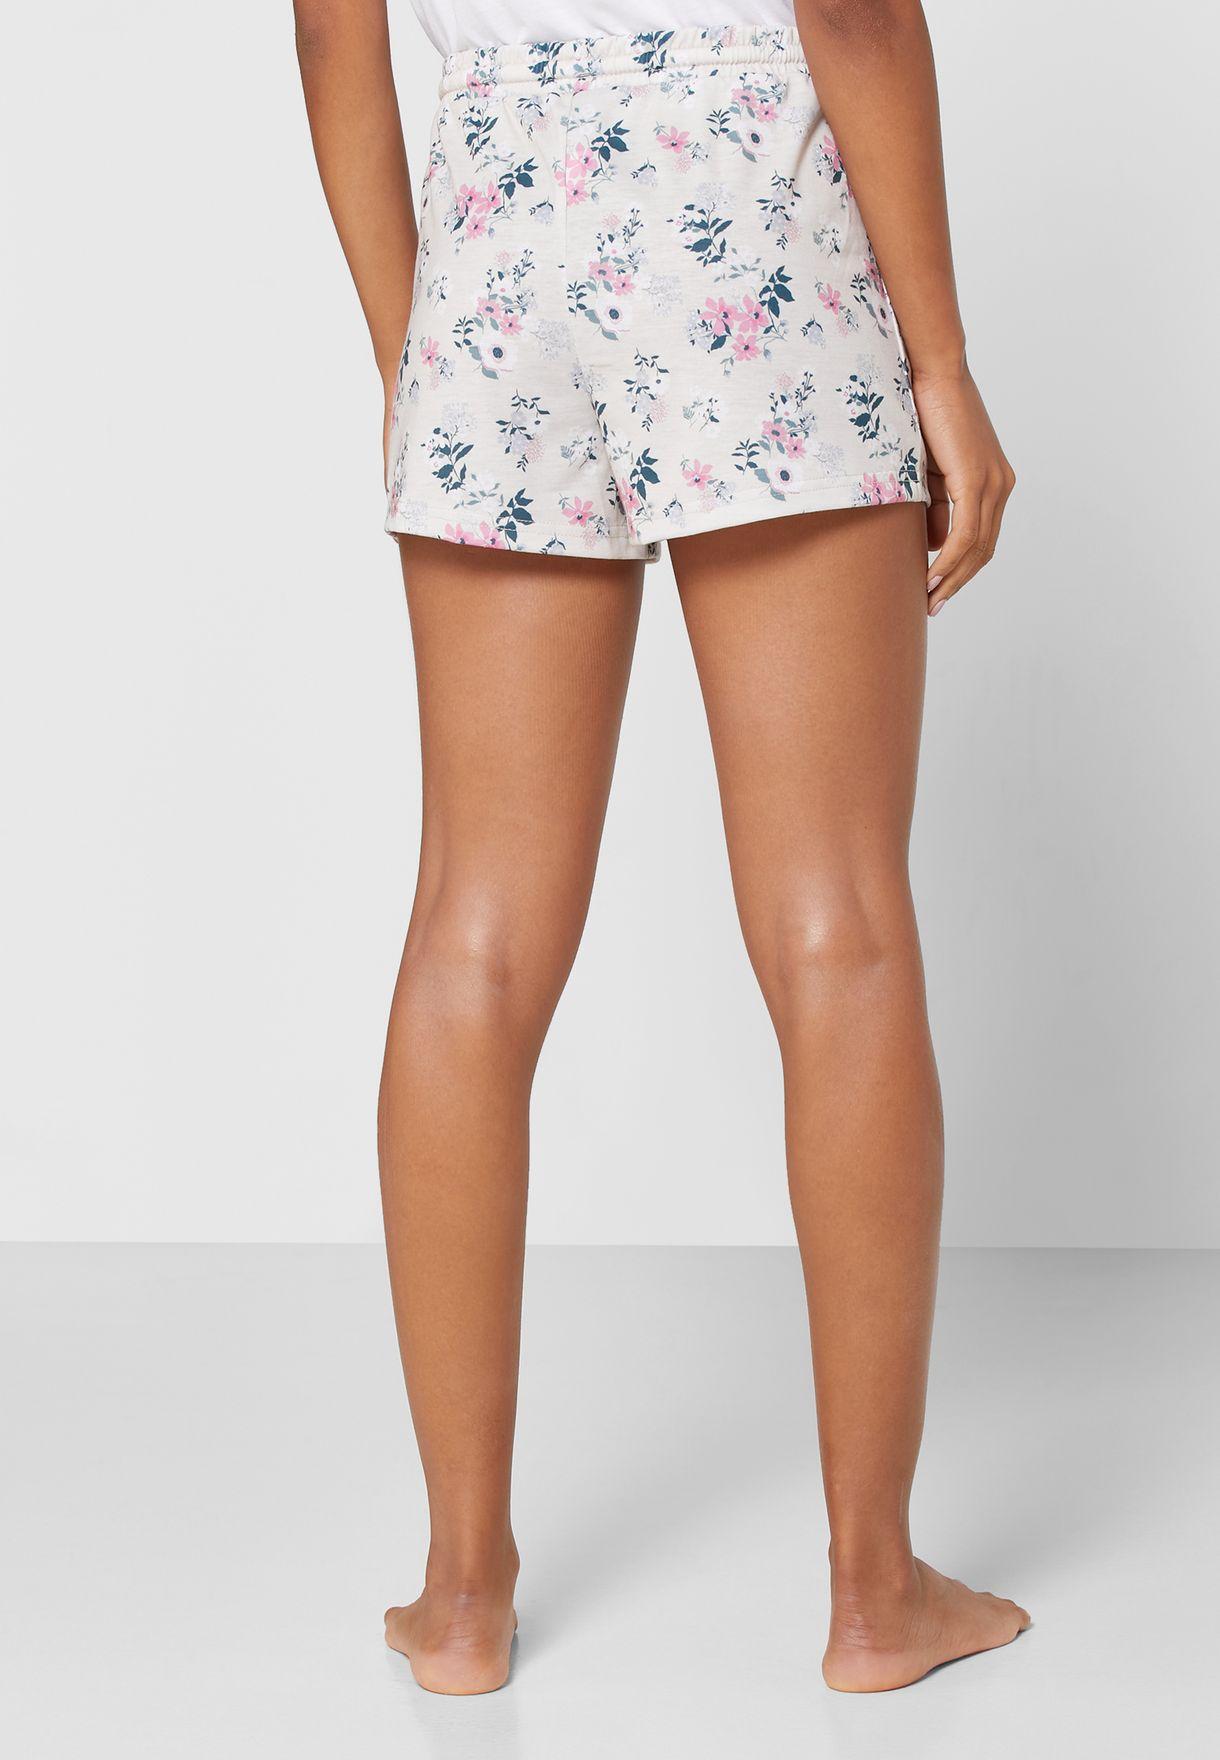 2 In 1 Printed Pyjama Shorts